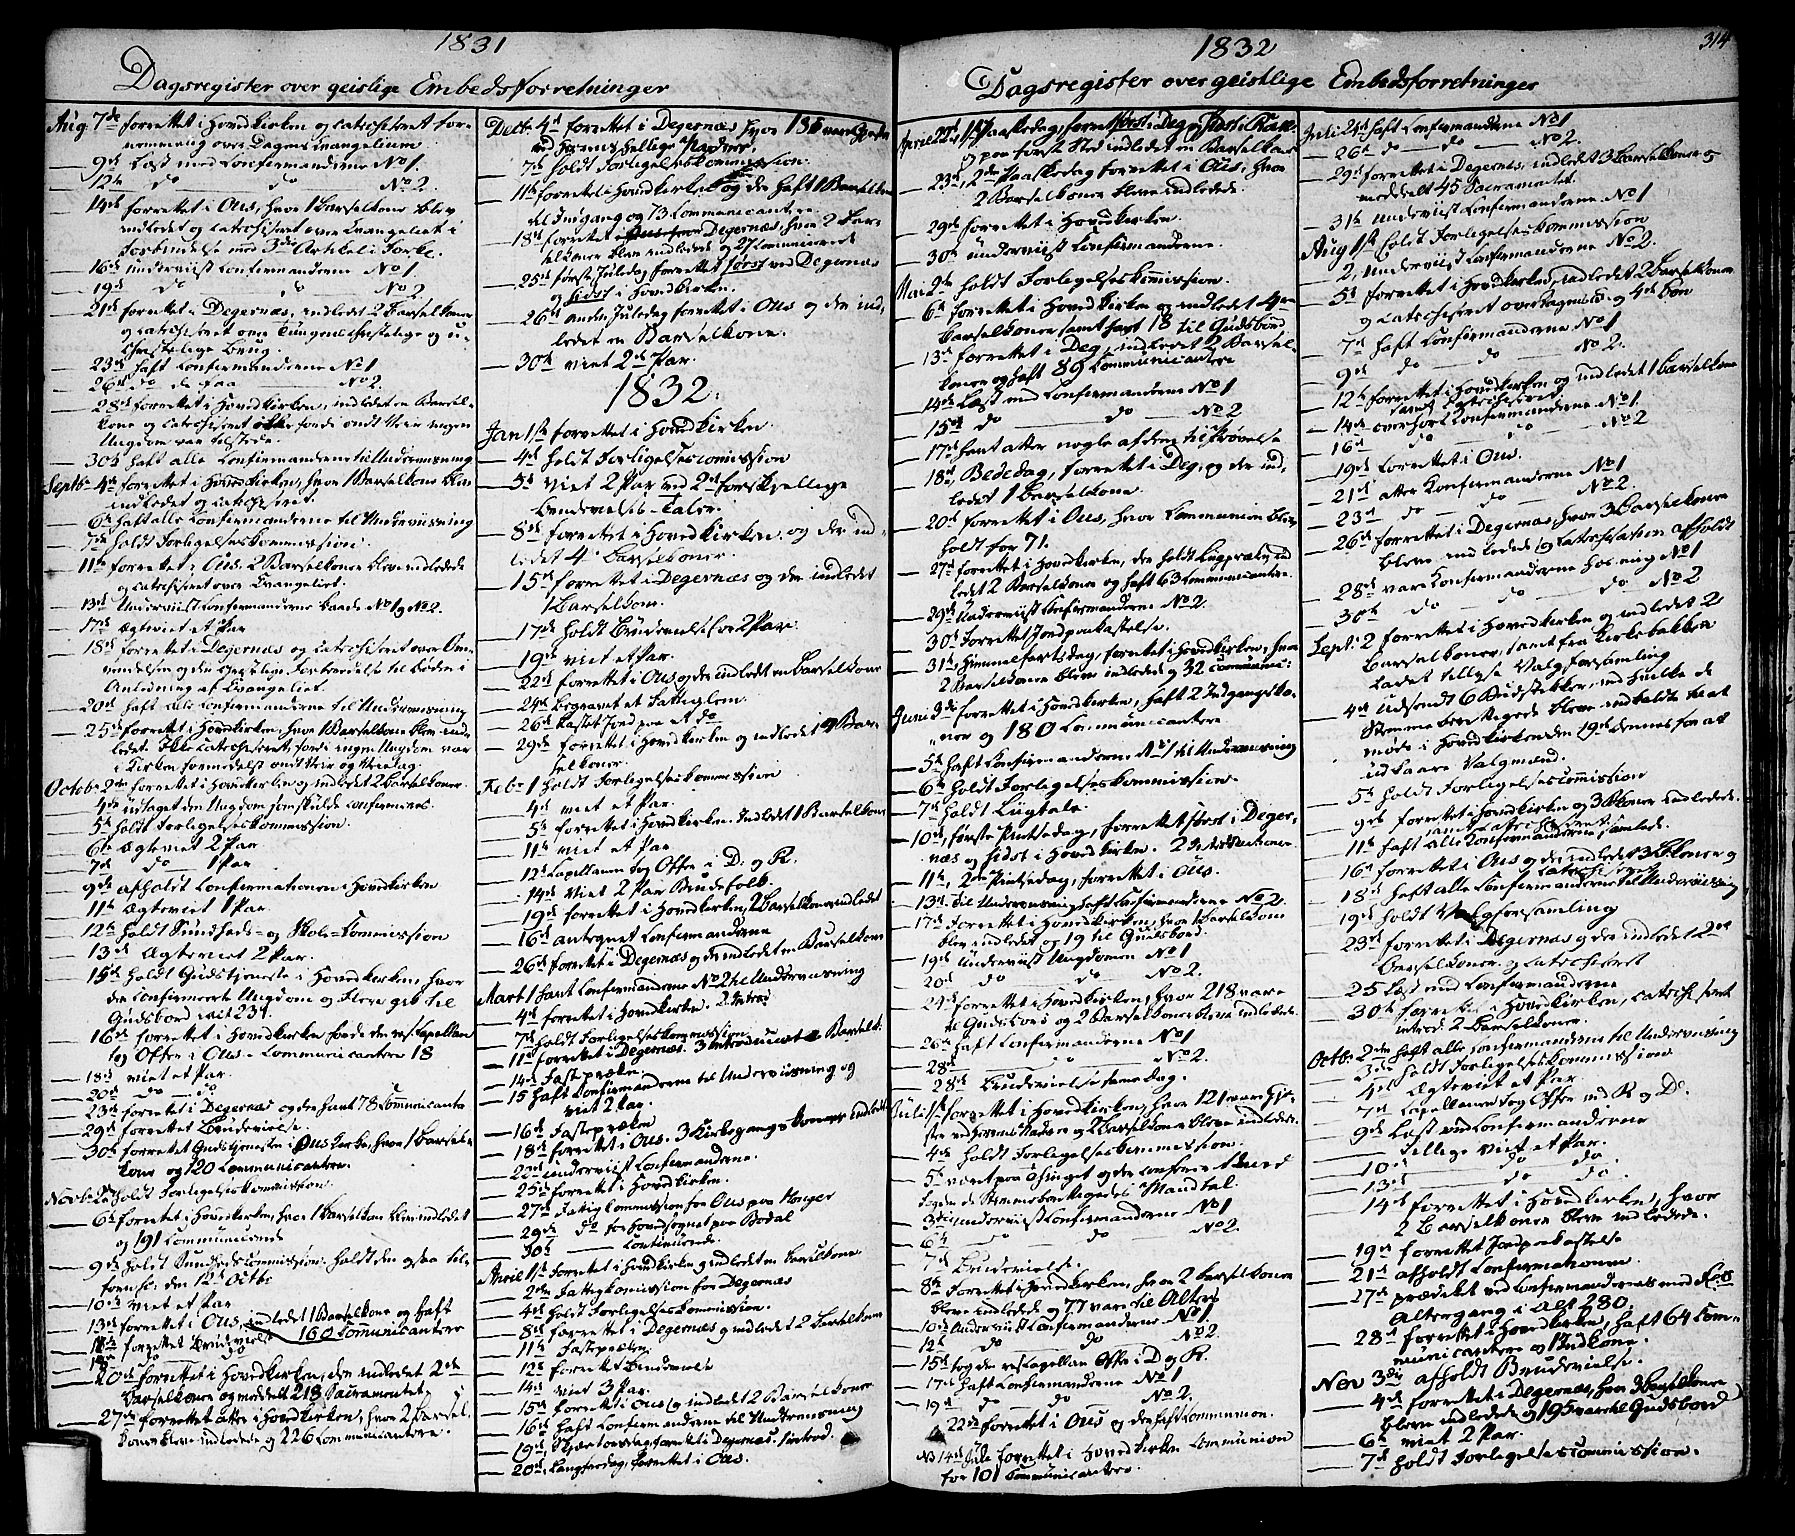 SAO, Rakkestad prestekontor Kirkebøker, F/Fa/L0007: Ministerialbok nr. I 7, 1825-1841, s. 314